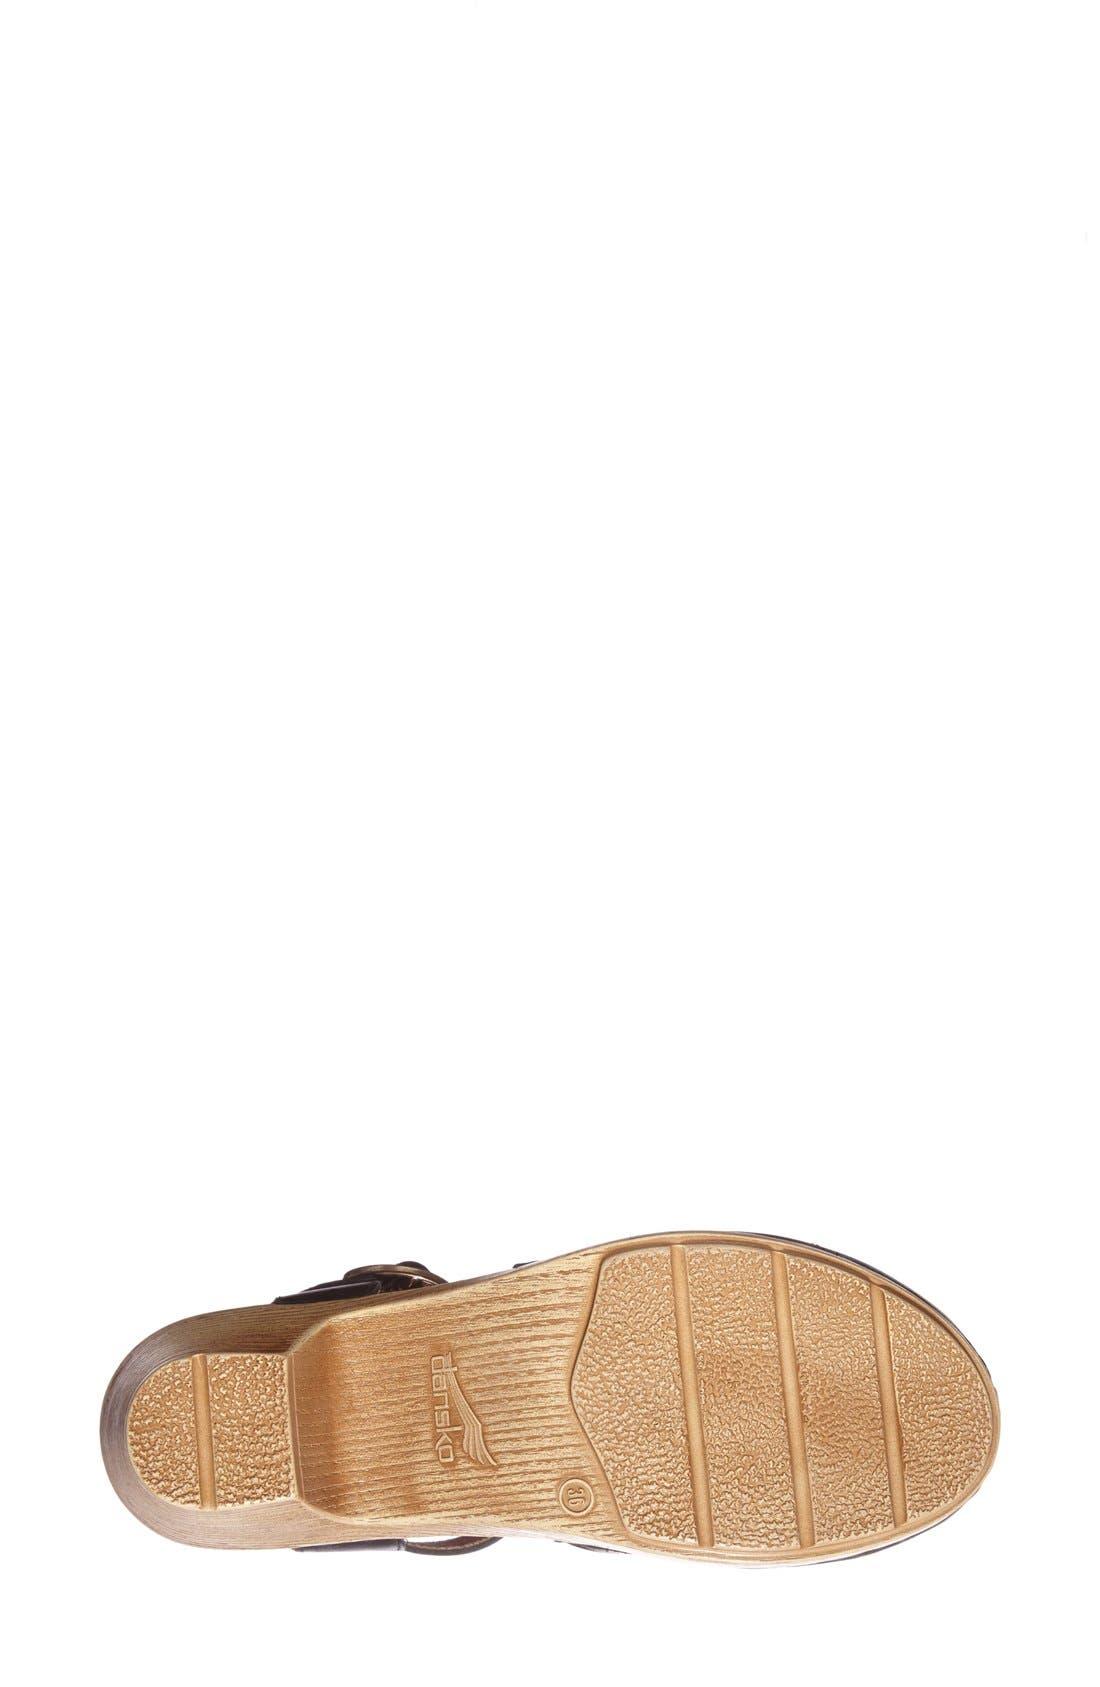 'Maisie' Ankle Strap Leather Pump,                             Alternate thumbnail 2, color,                             001